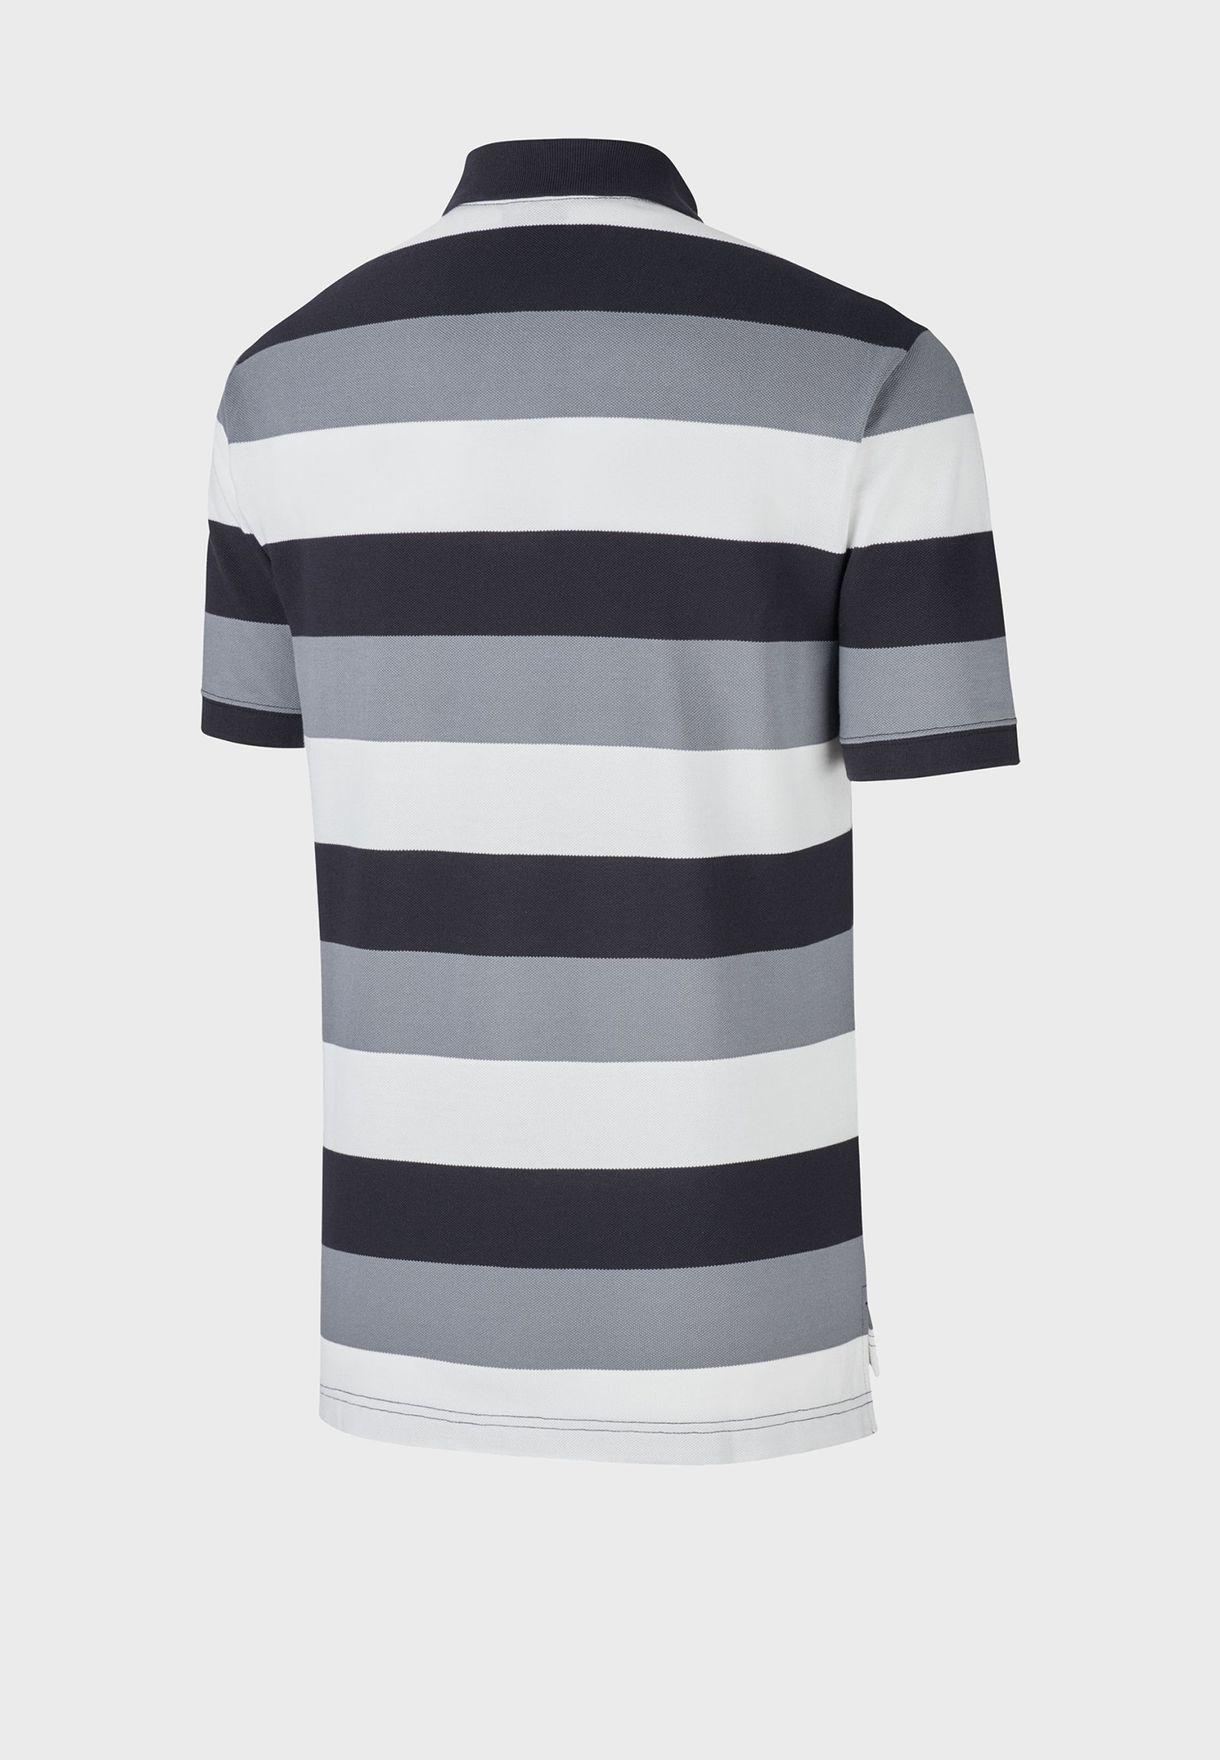 NSW Matchup Stripe Polo